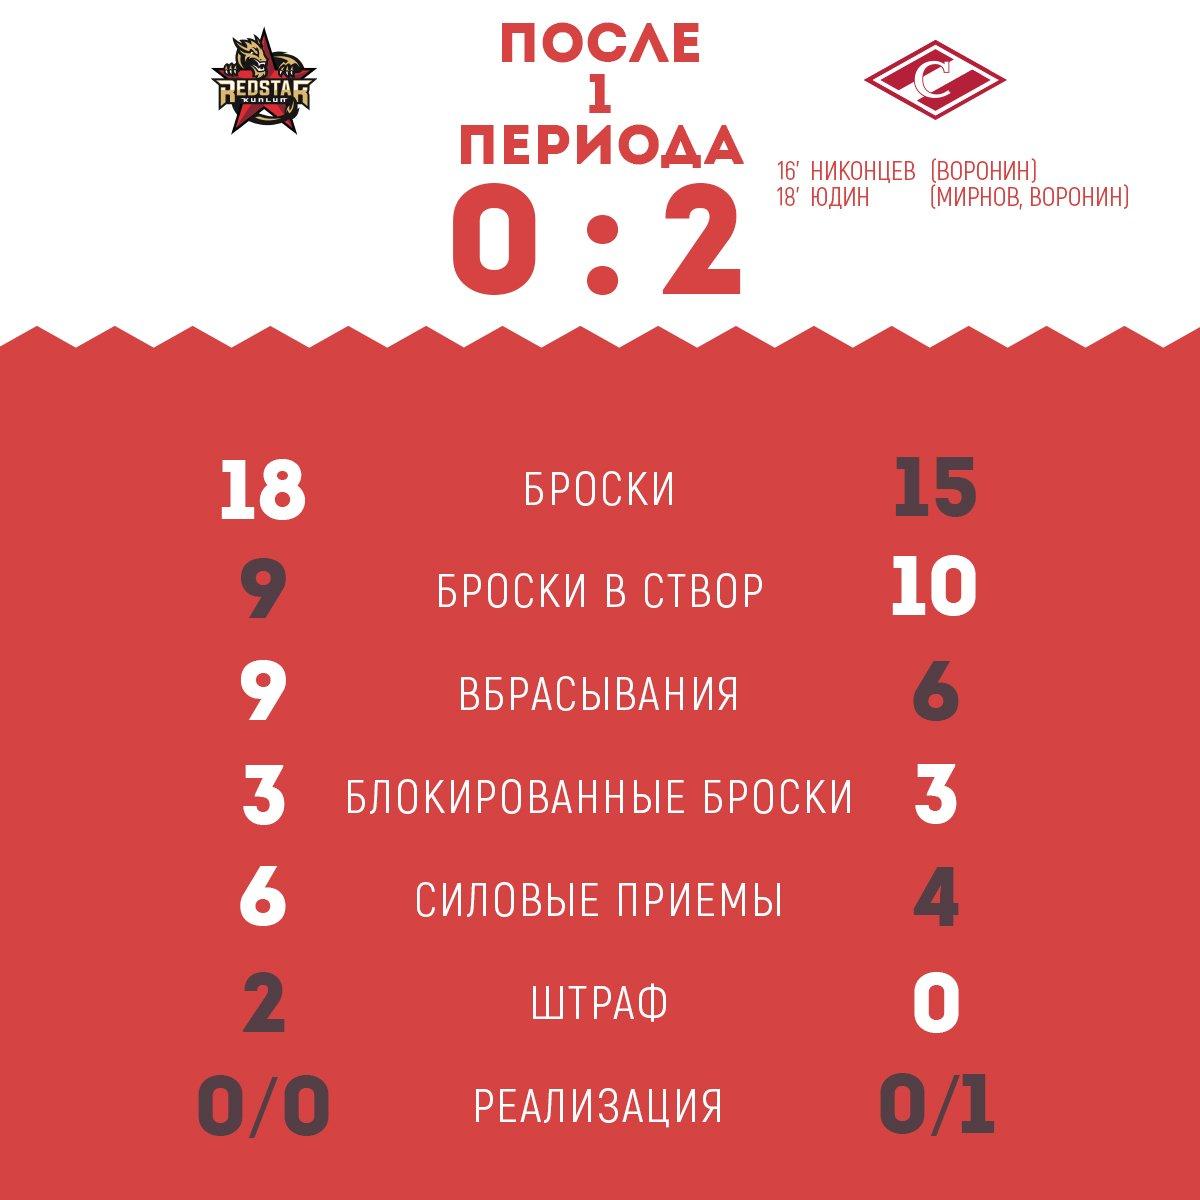 Статистика матча «Куньлунь Ред Стар» vs «Спартак» после 1-го периода